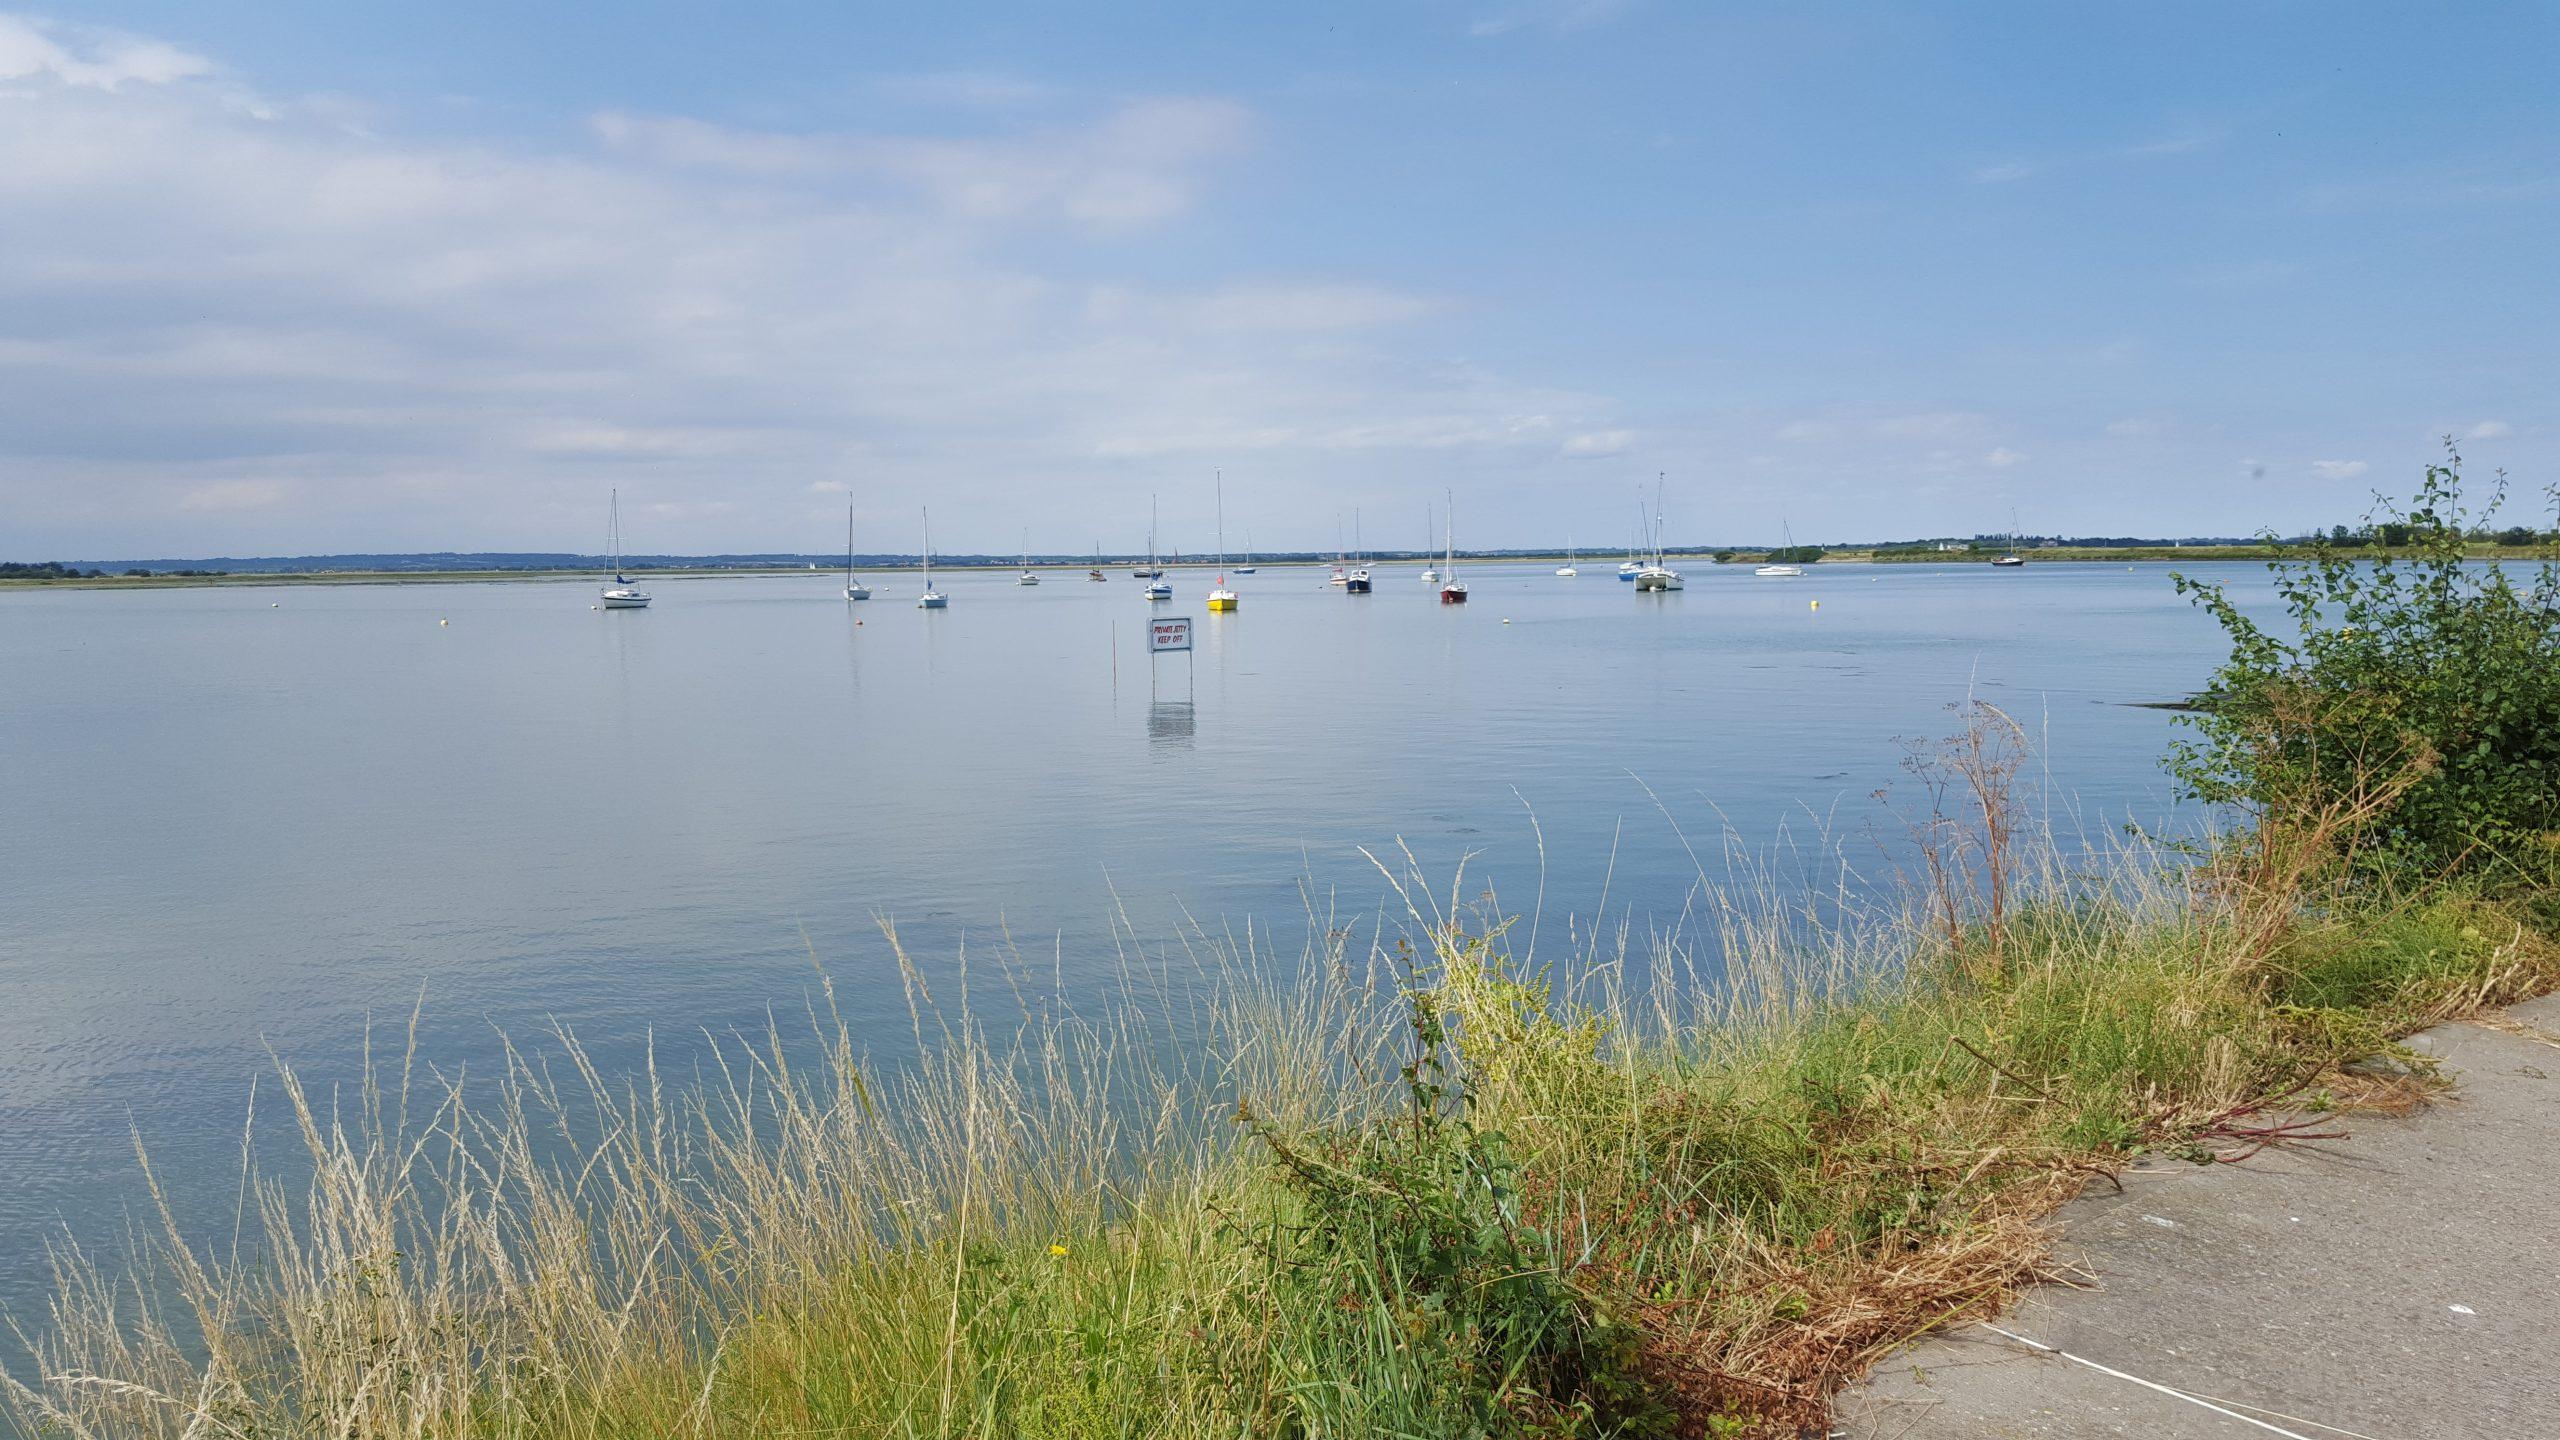 Harlow (Blackwater) Sailing